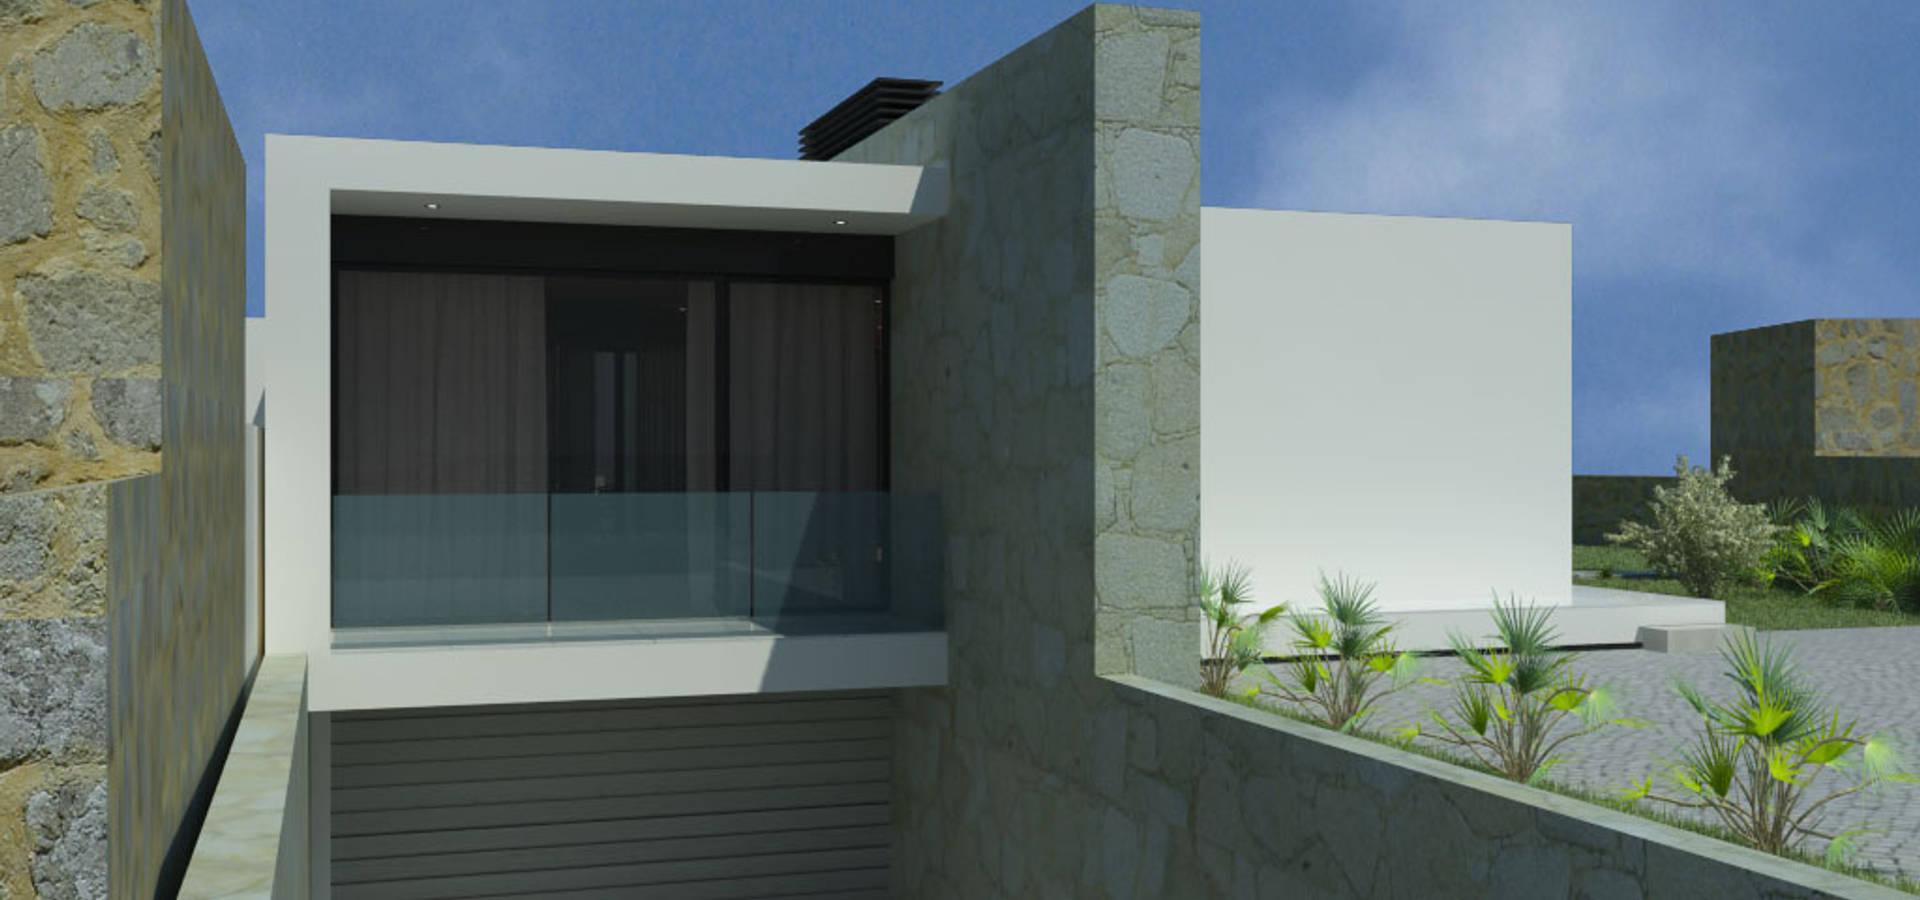 Tiago Araújo Arquitectura & Design